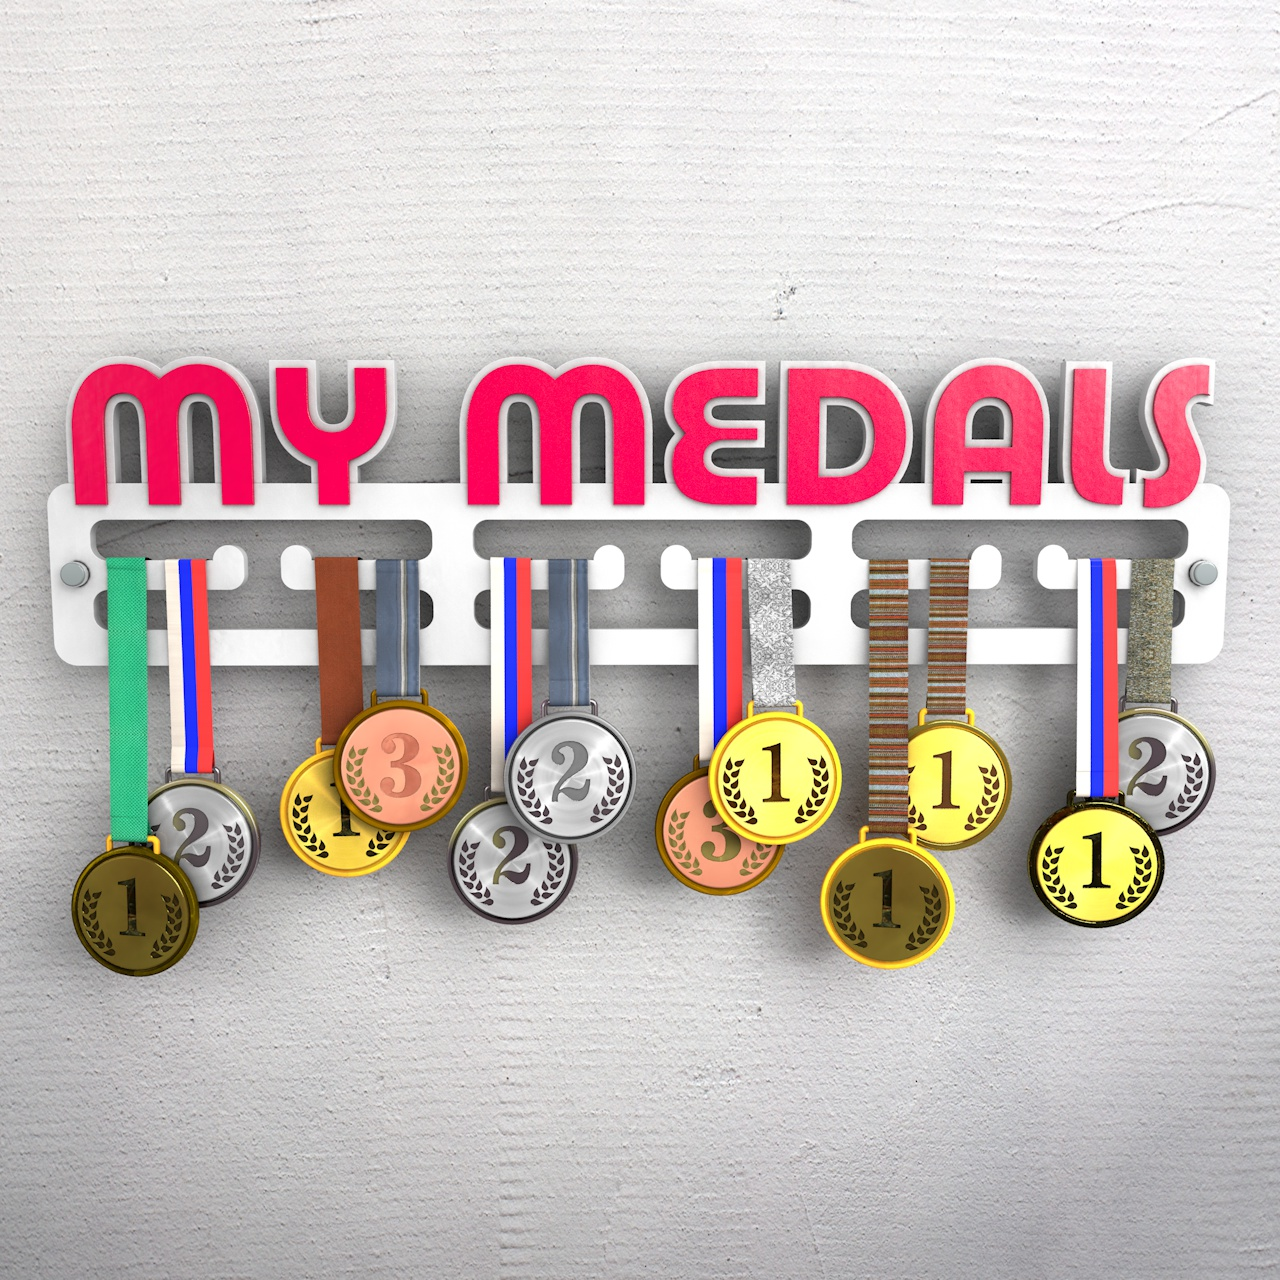 "Медальница с надписью ""My medals"""